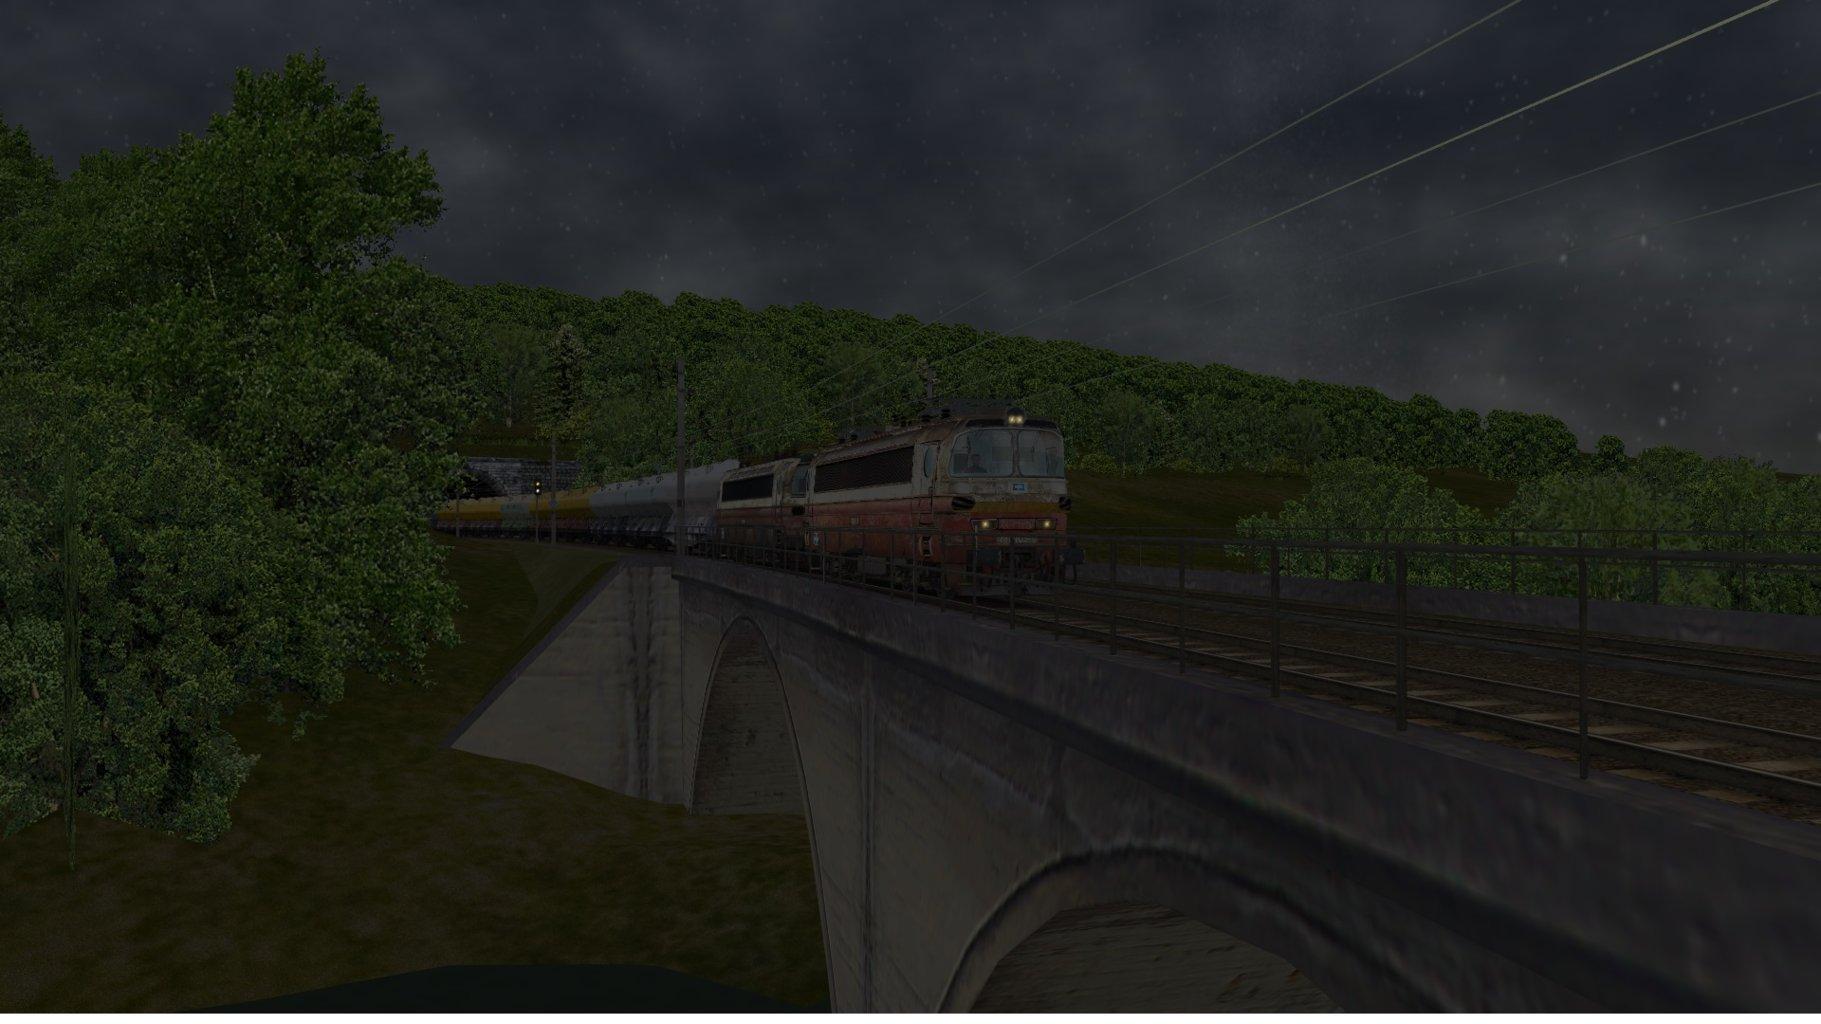 Open Rails 2021-04-06 09-39-37.jpg